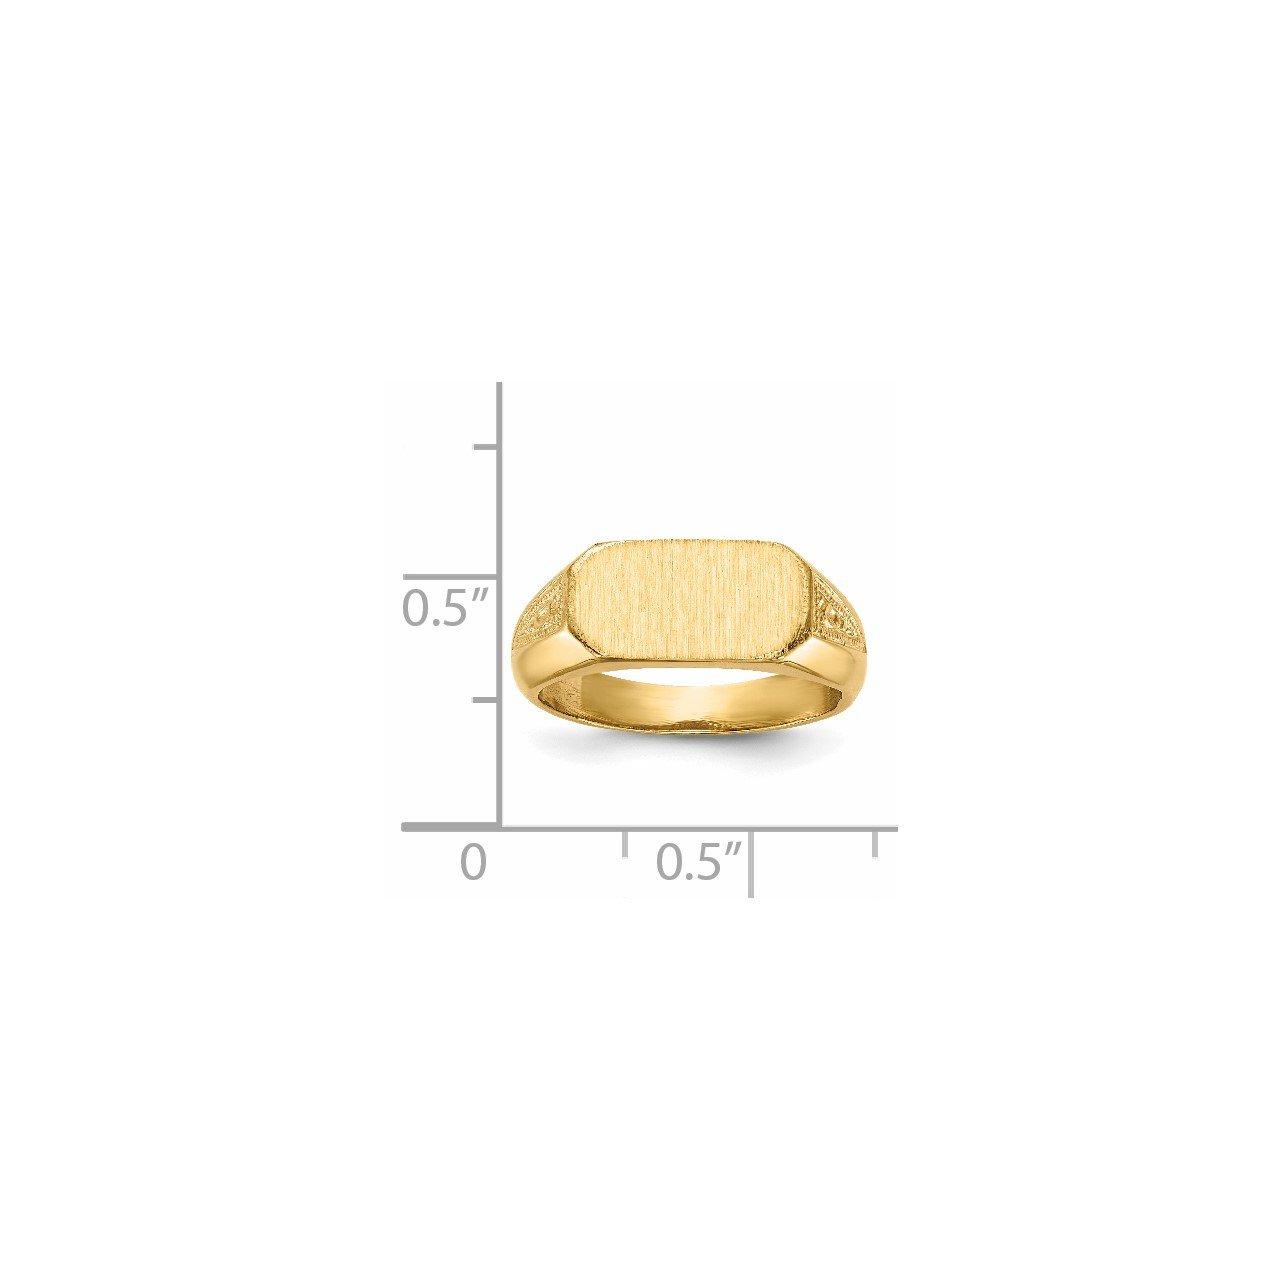 14k 6.0x12.5mm Closed Back Signet Ring-4